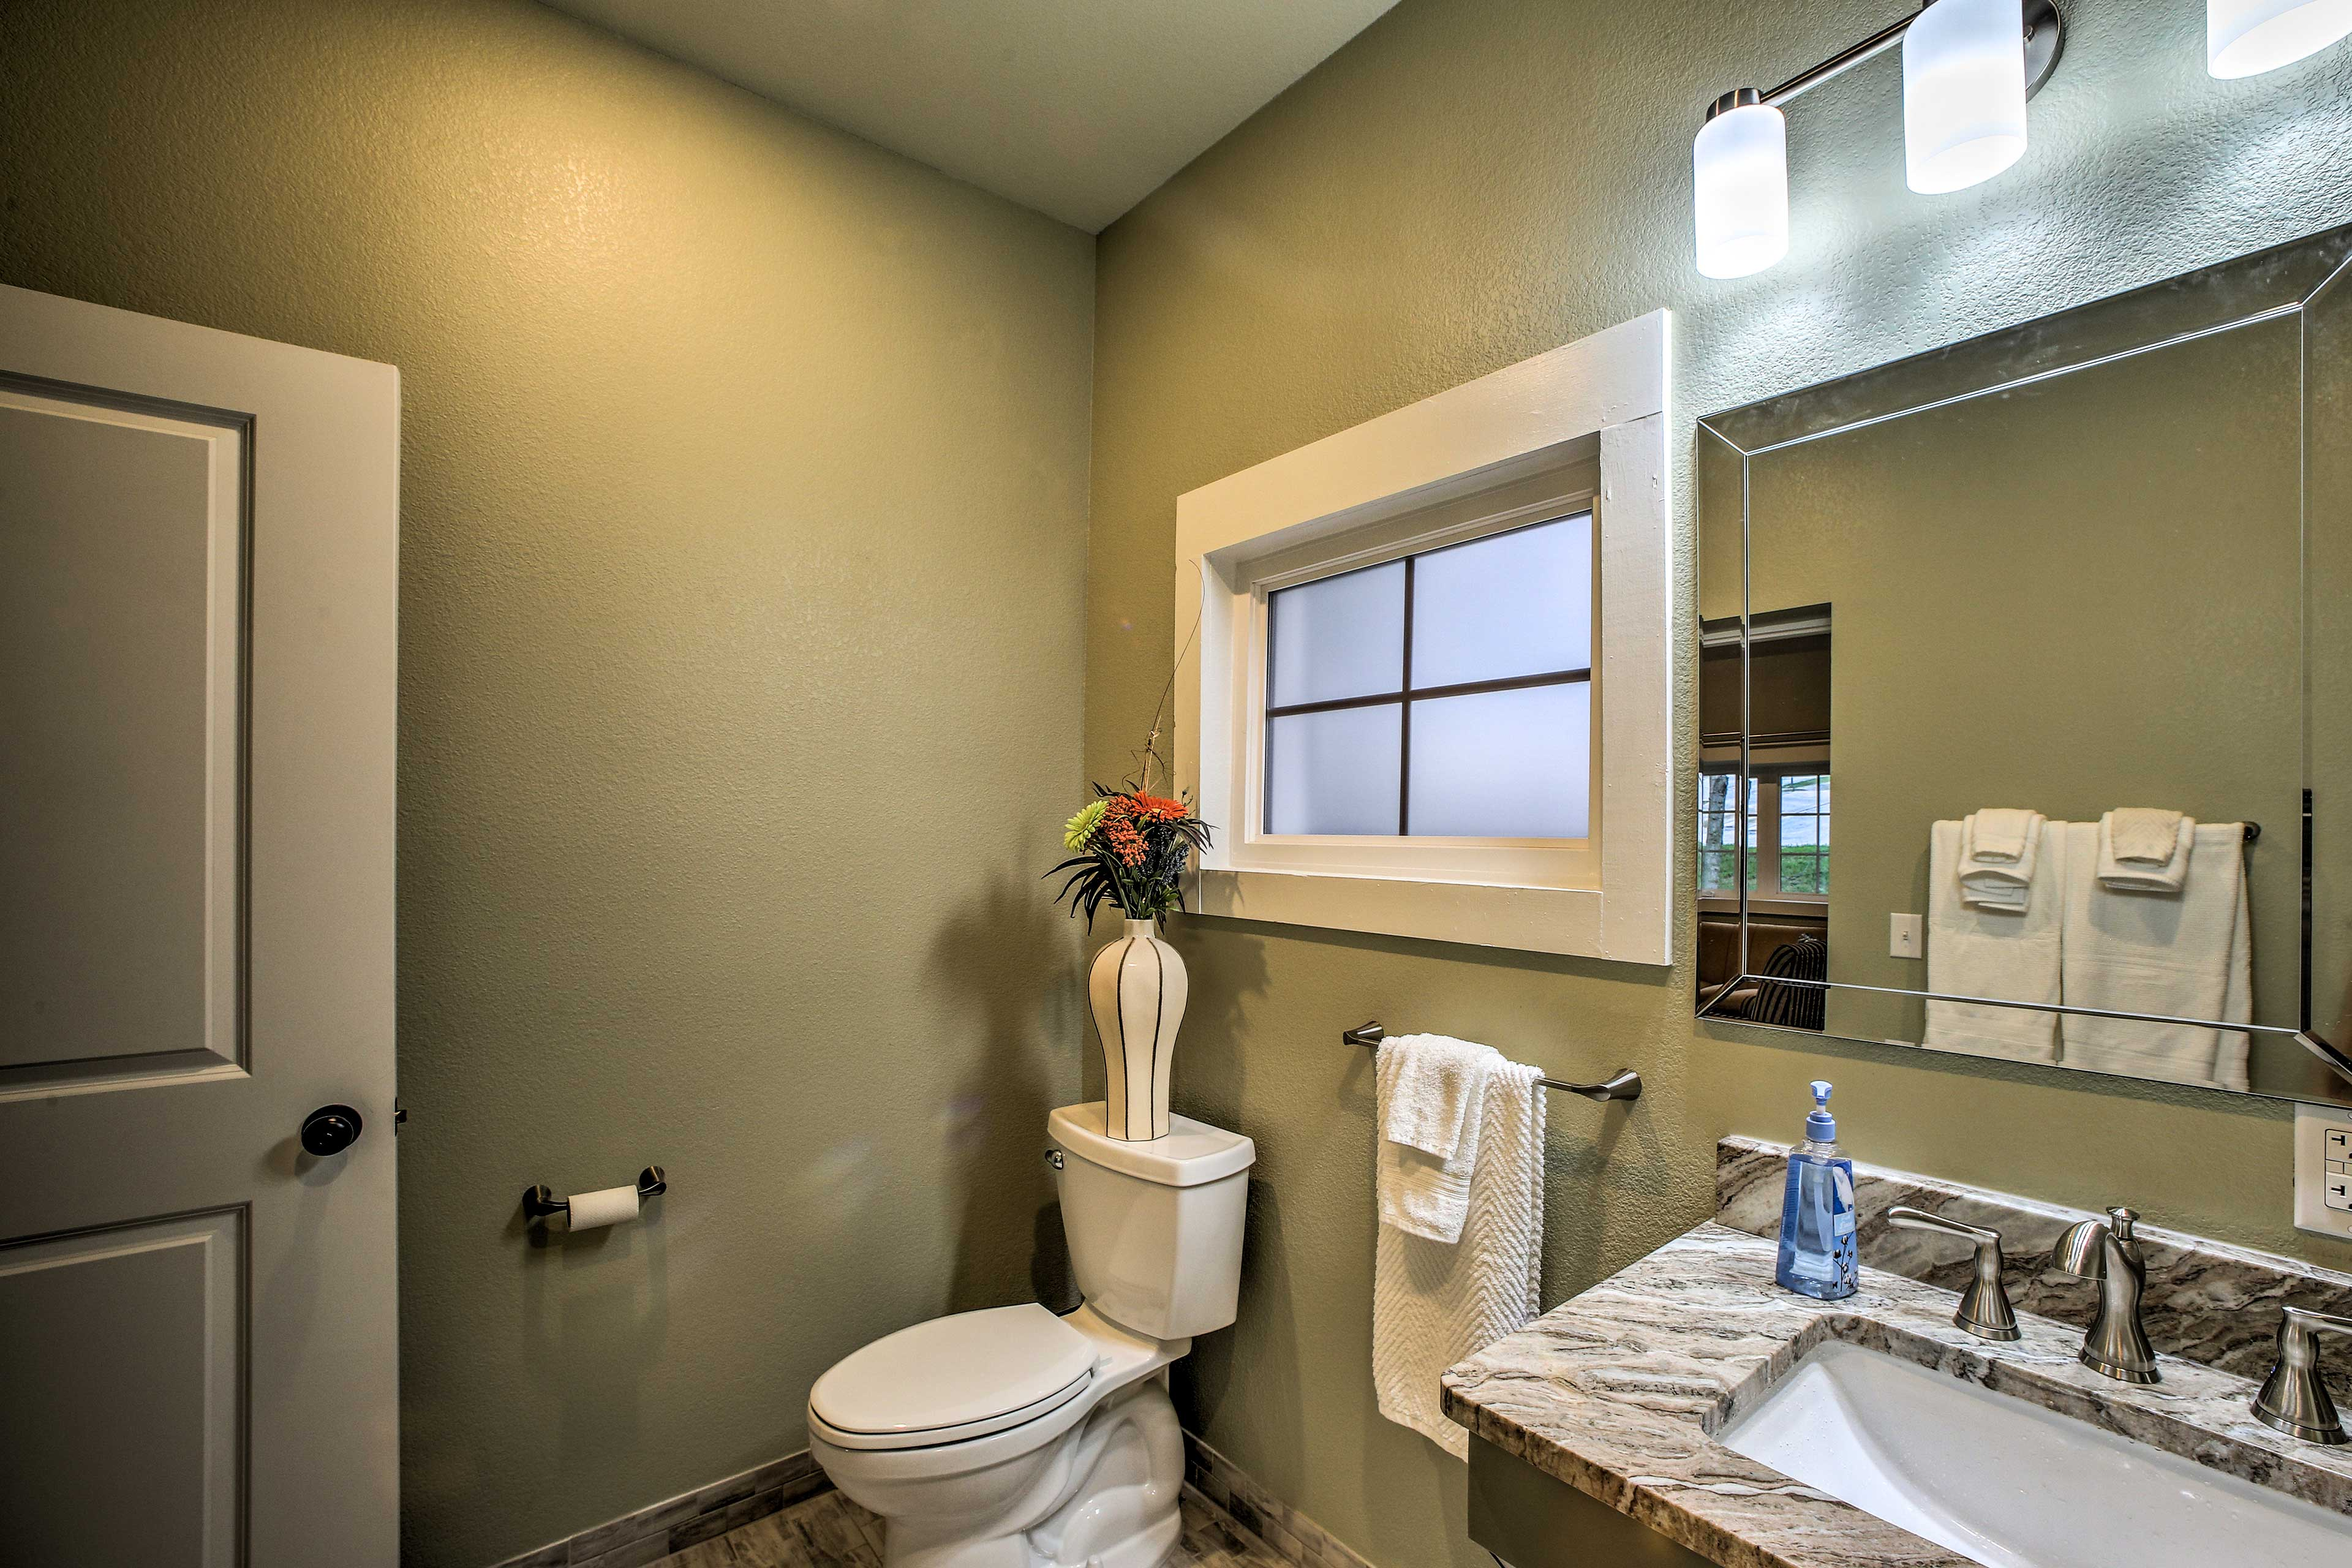 The bathroom has fresh towels waiting!